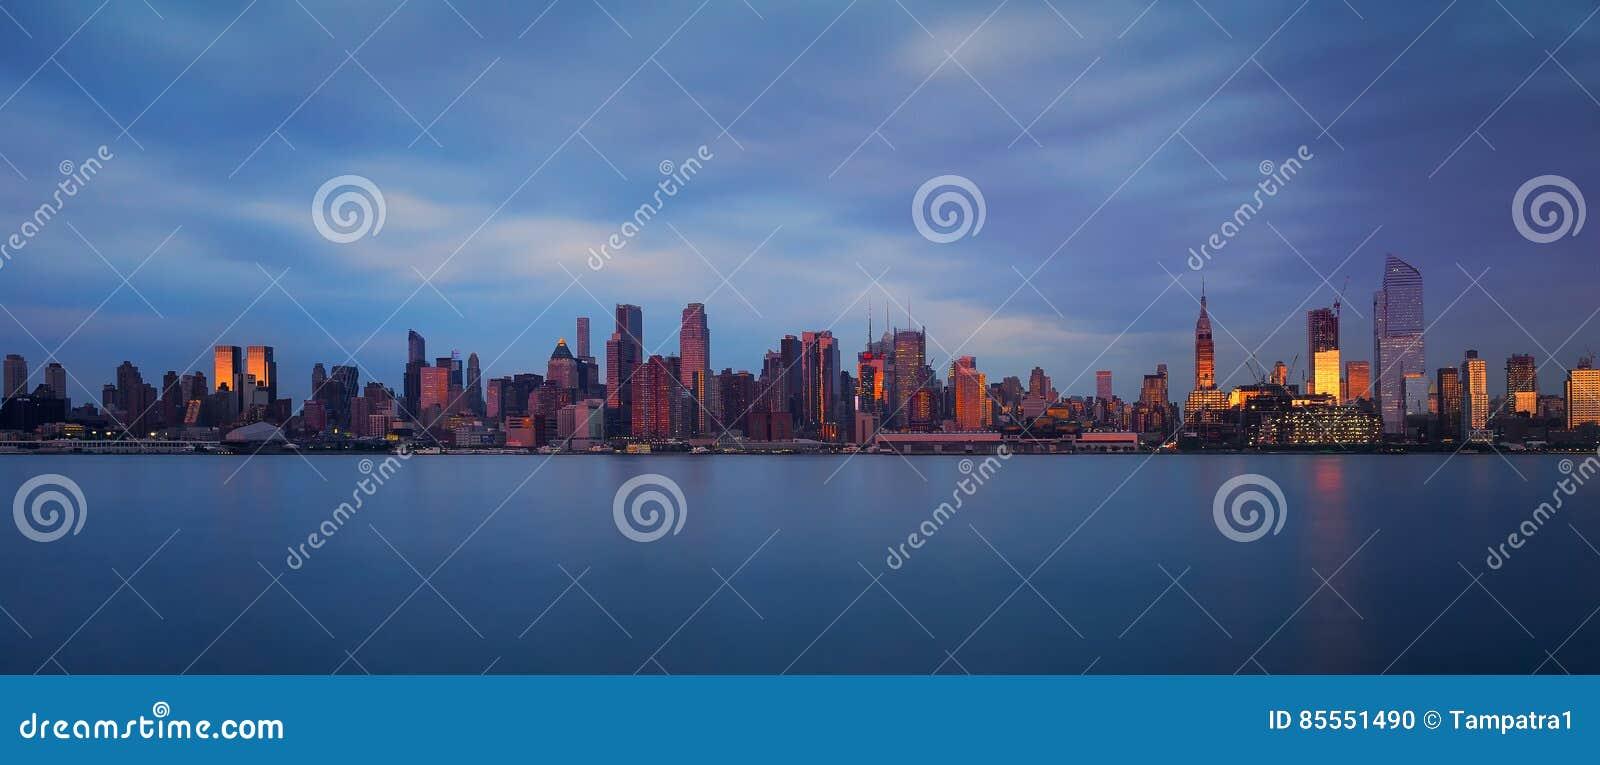 New- York Cityskyline, USA